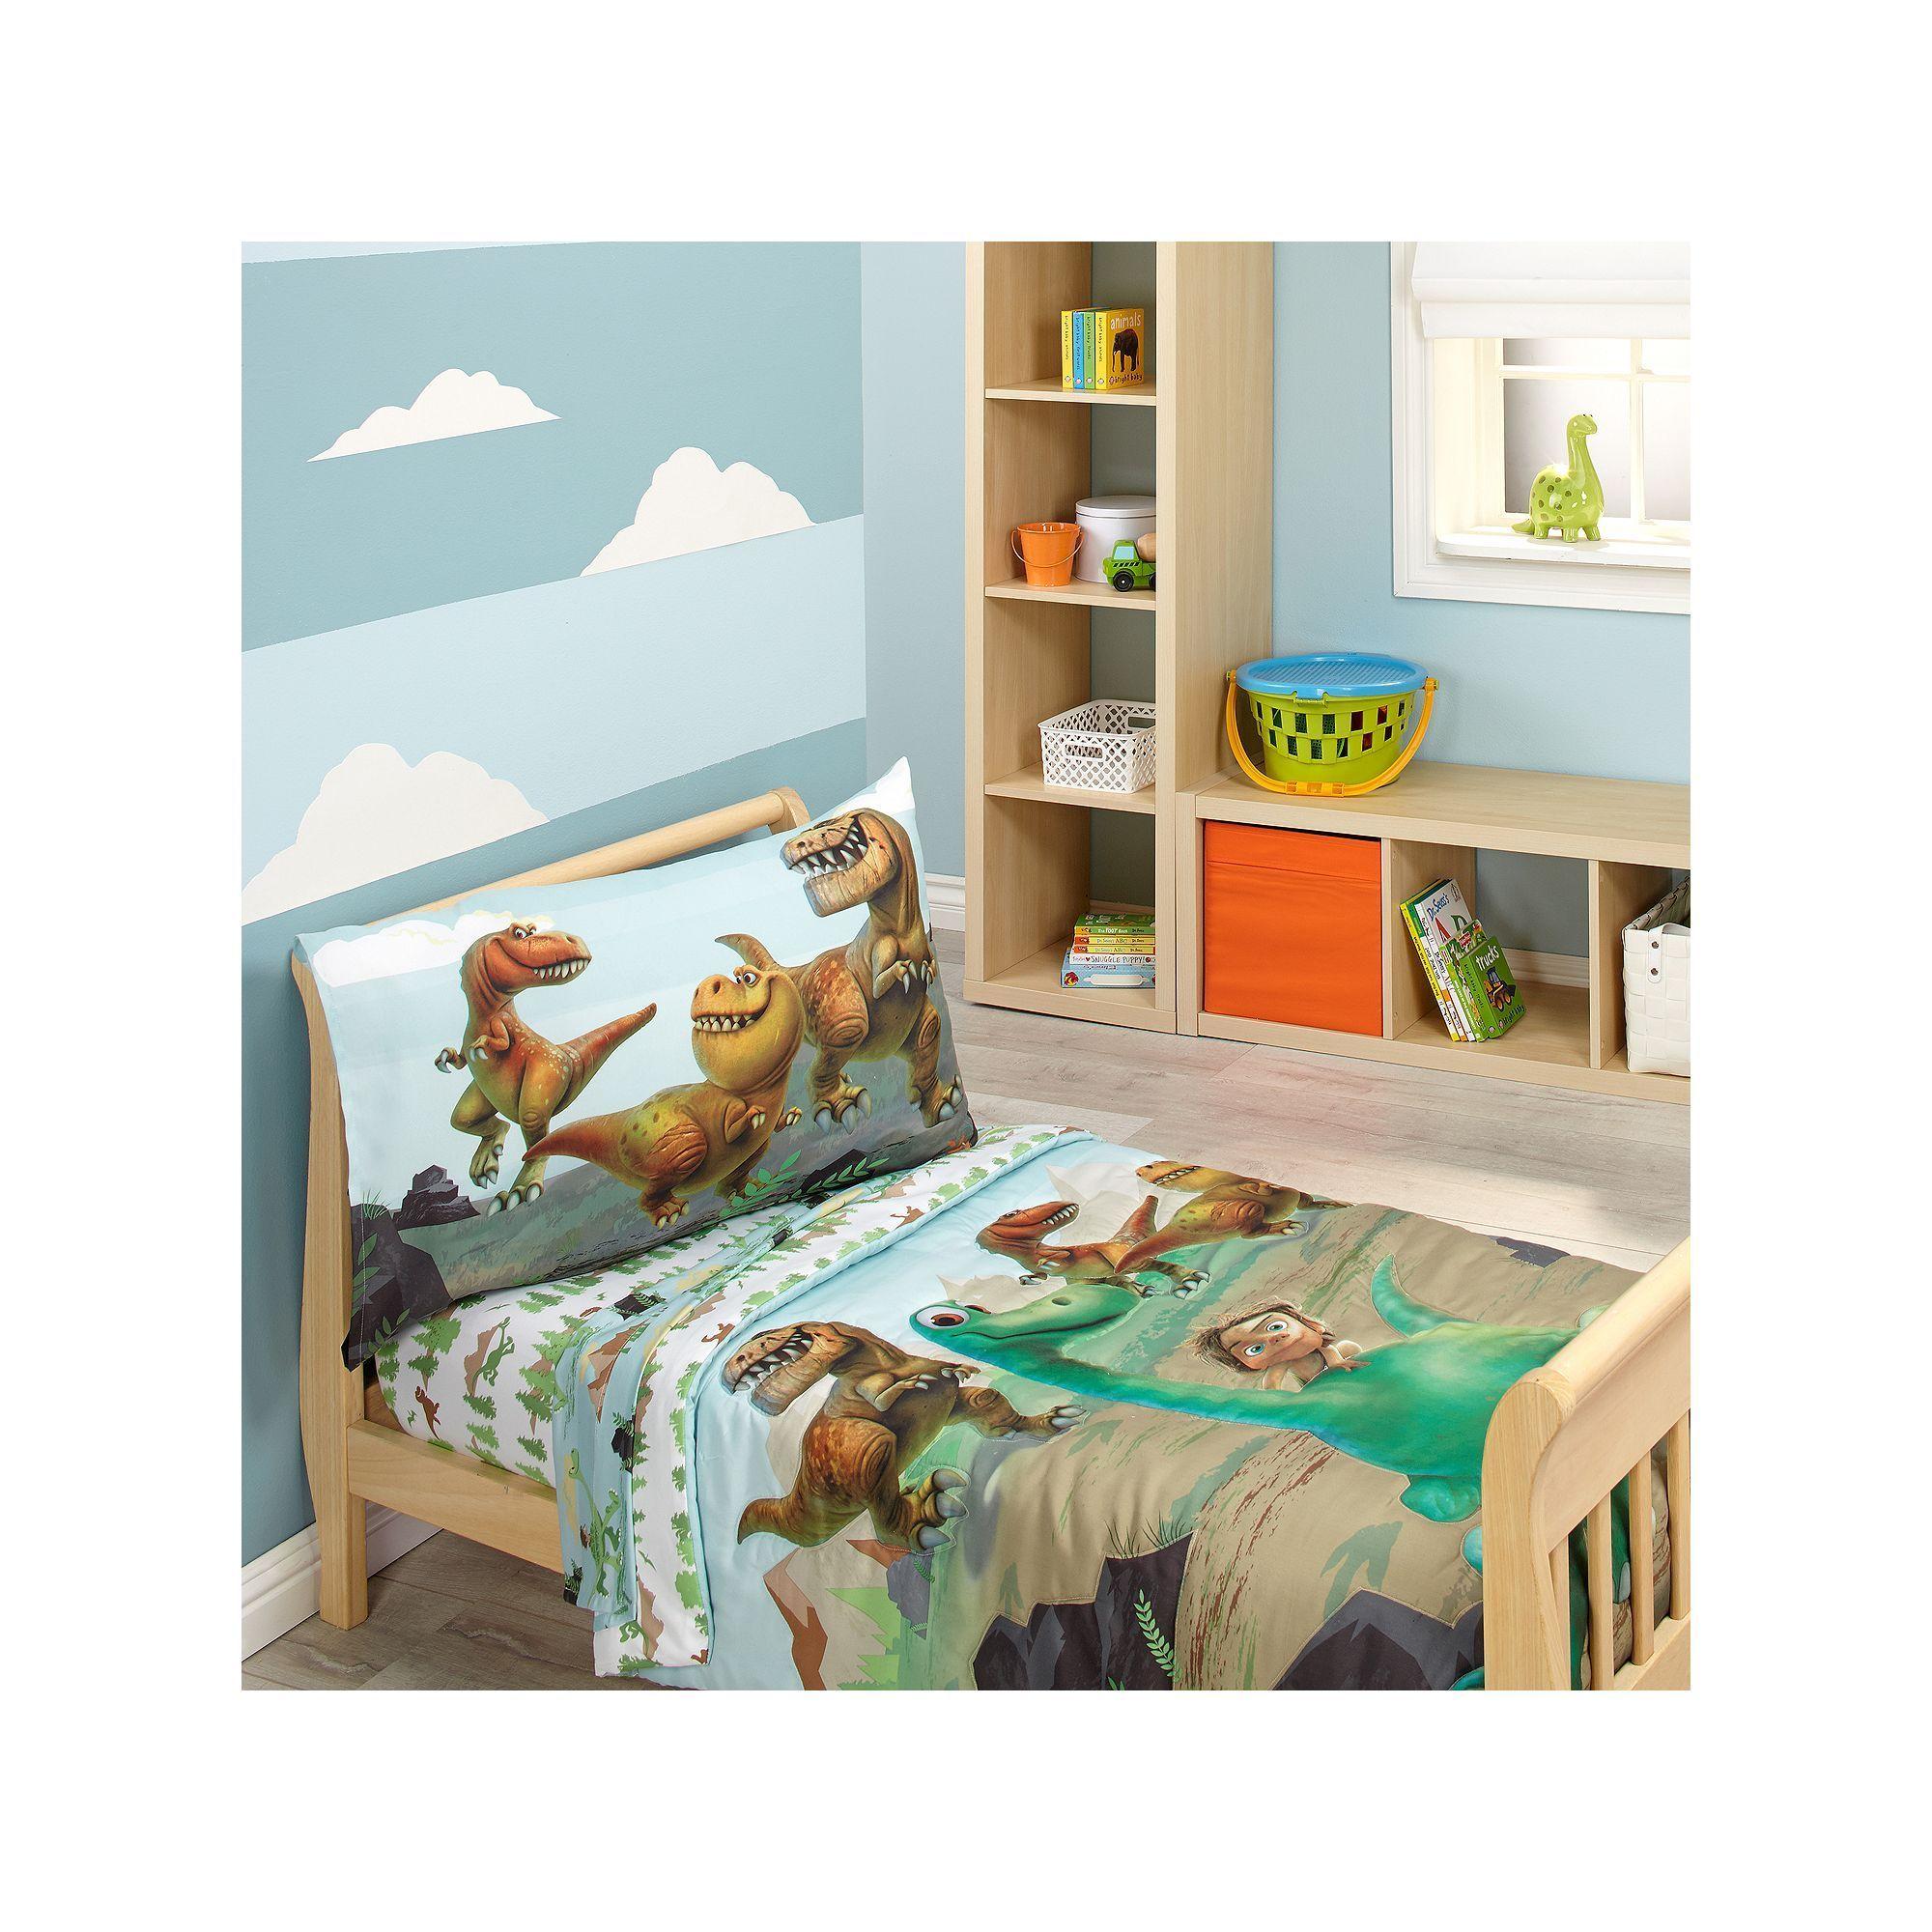 Disney Pixar The Good Dinosaur 4 Pc Toddler Bedding Set Green One Size